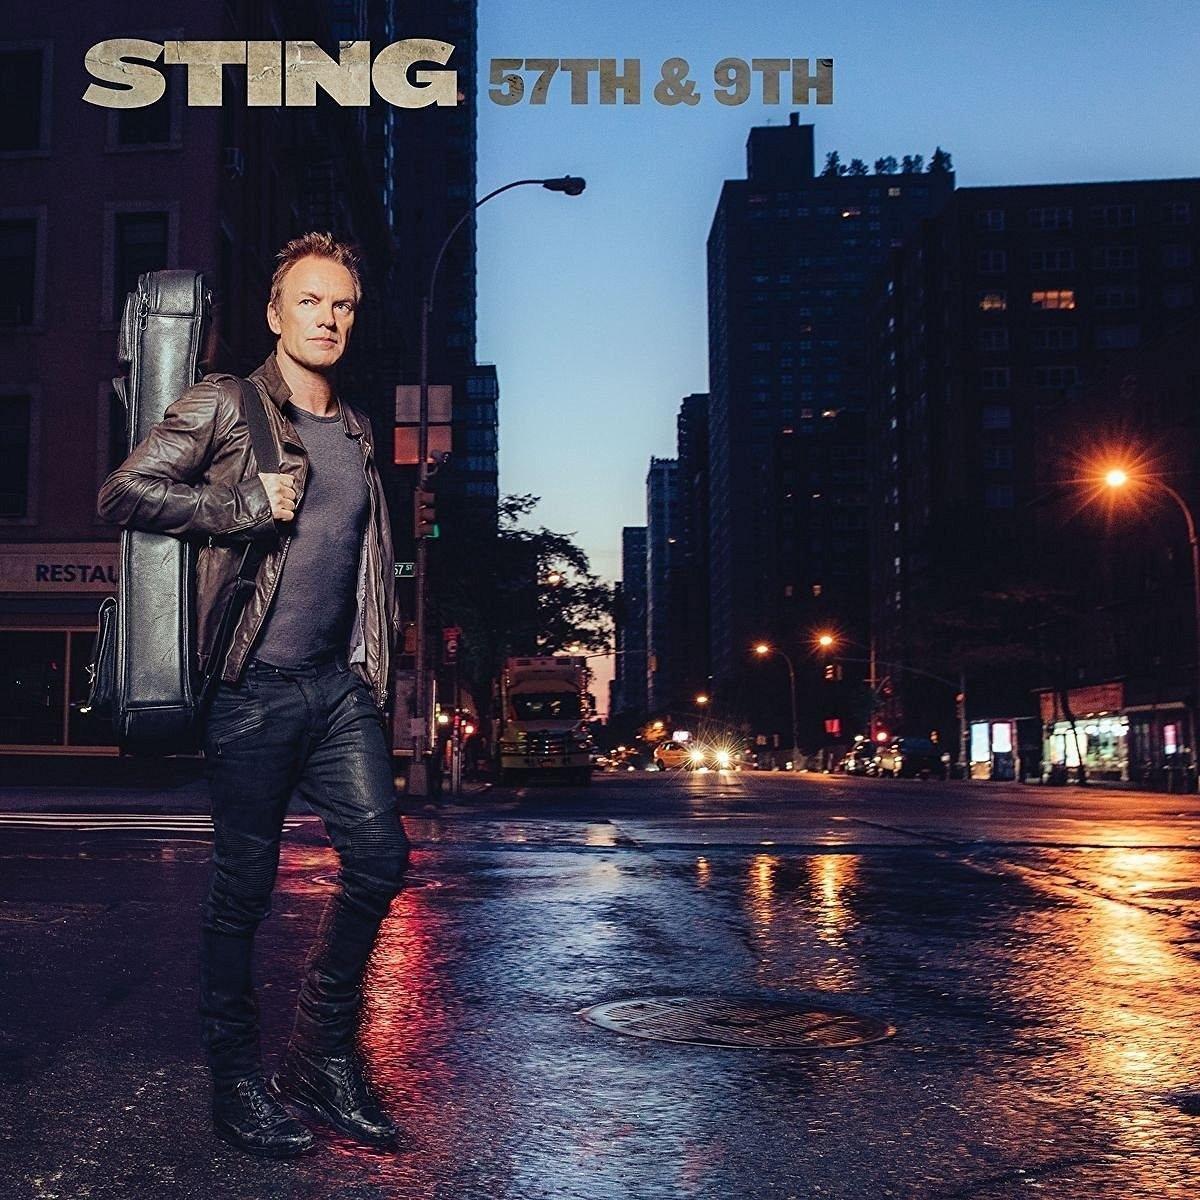 57th & 9th- Sting.jpg